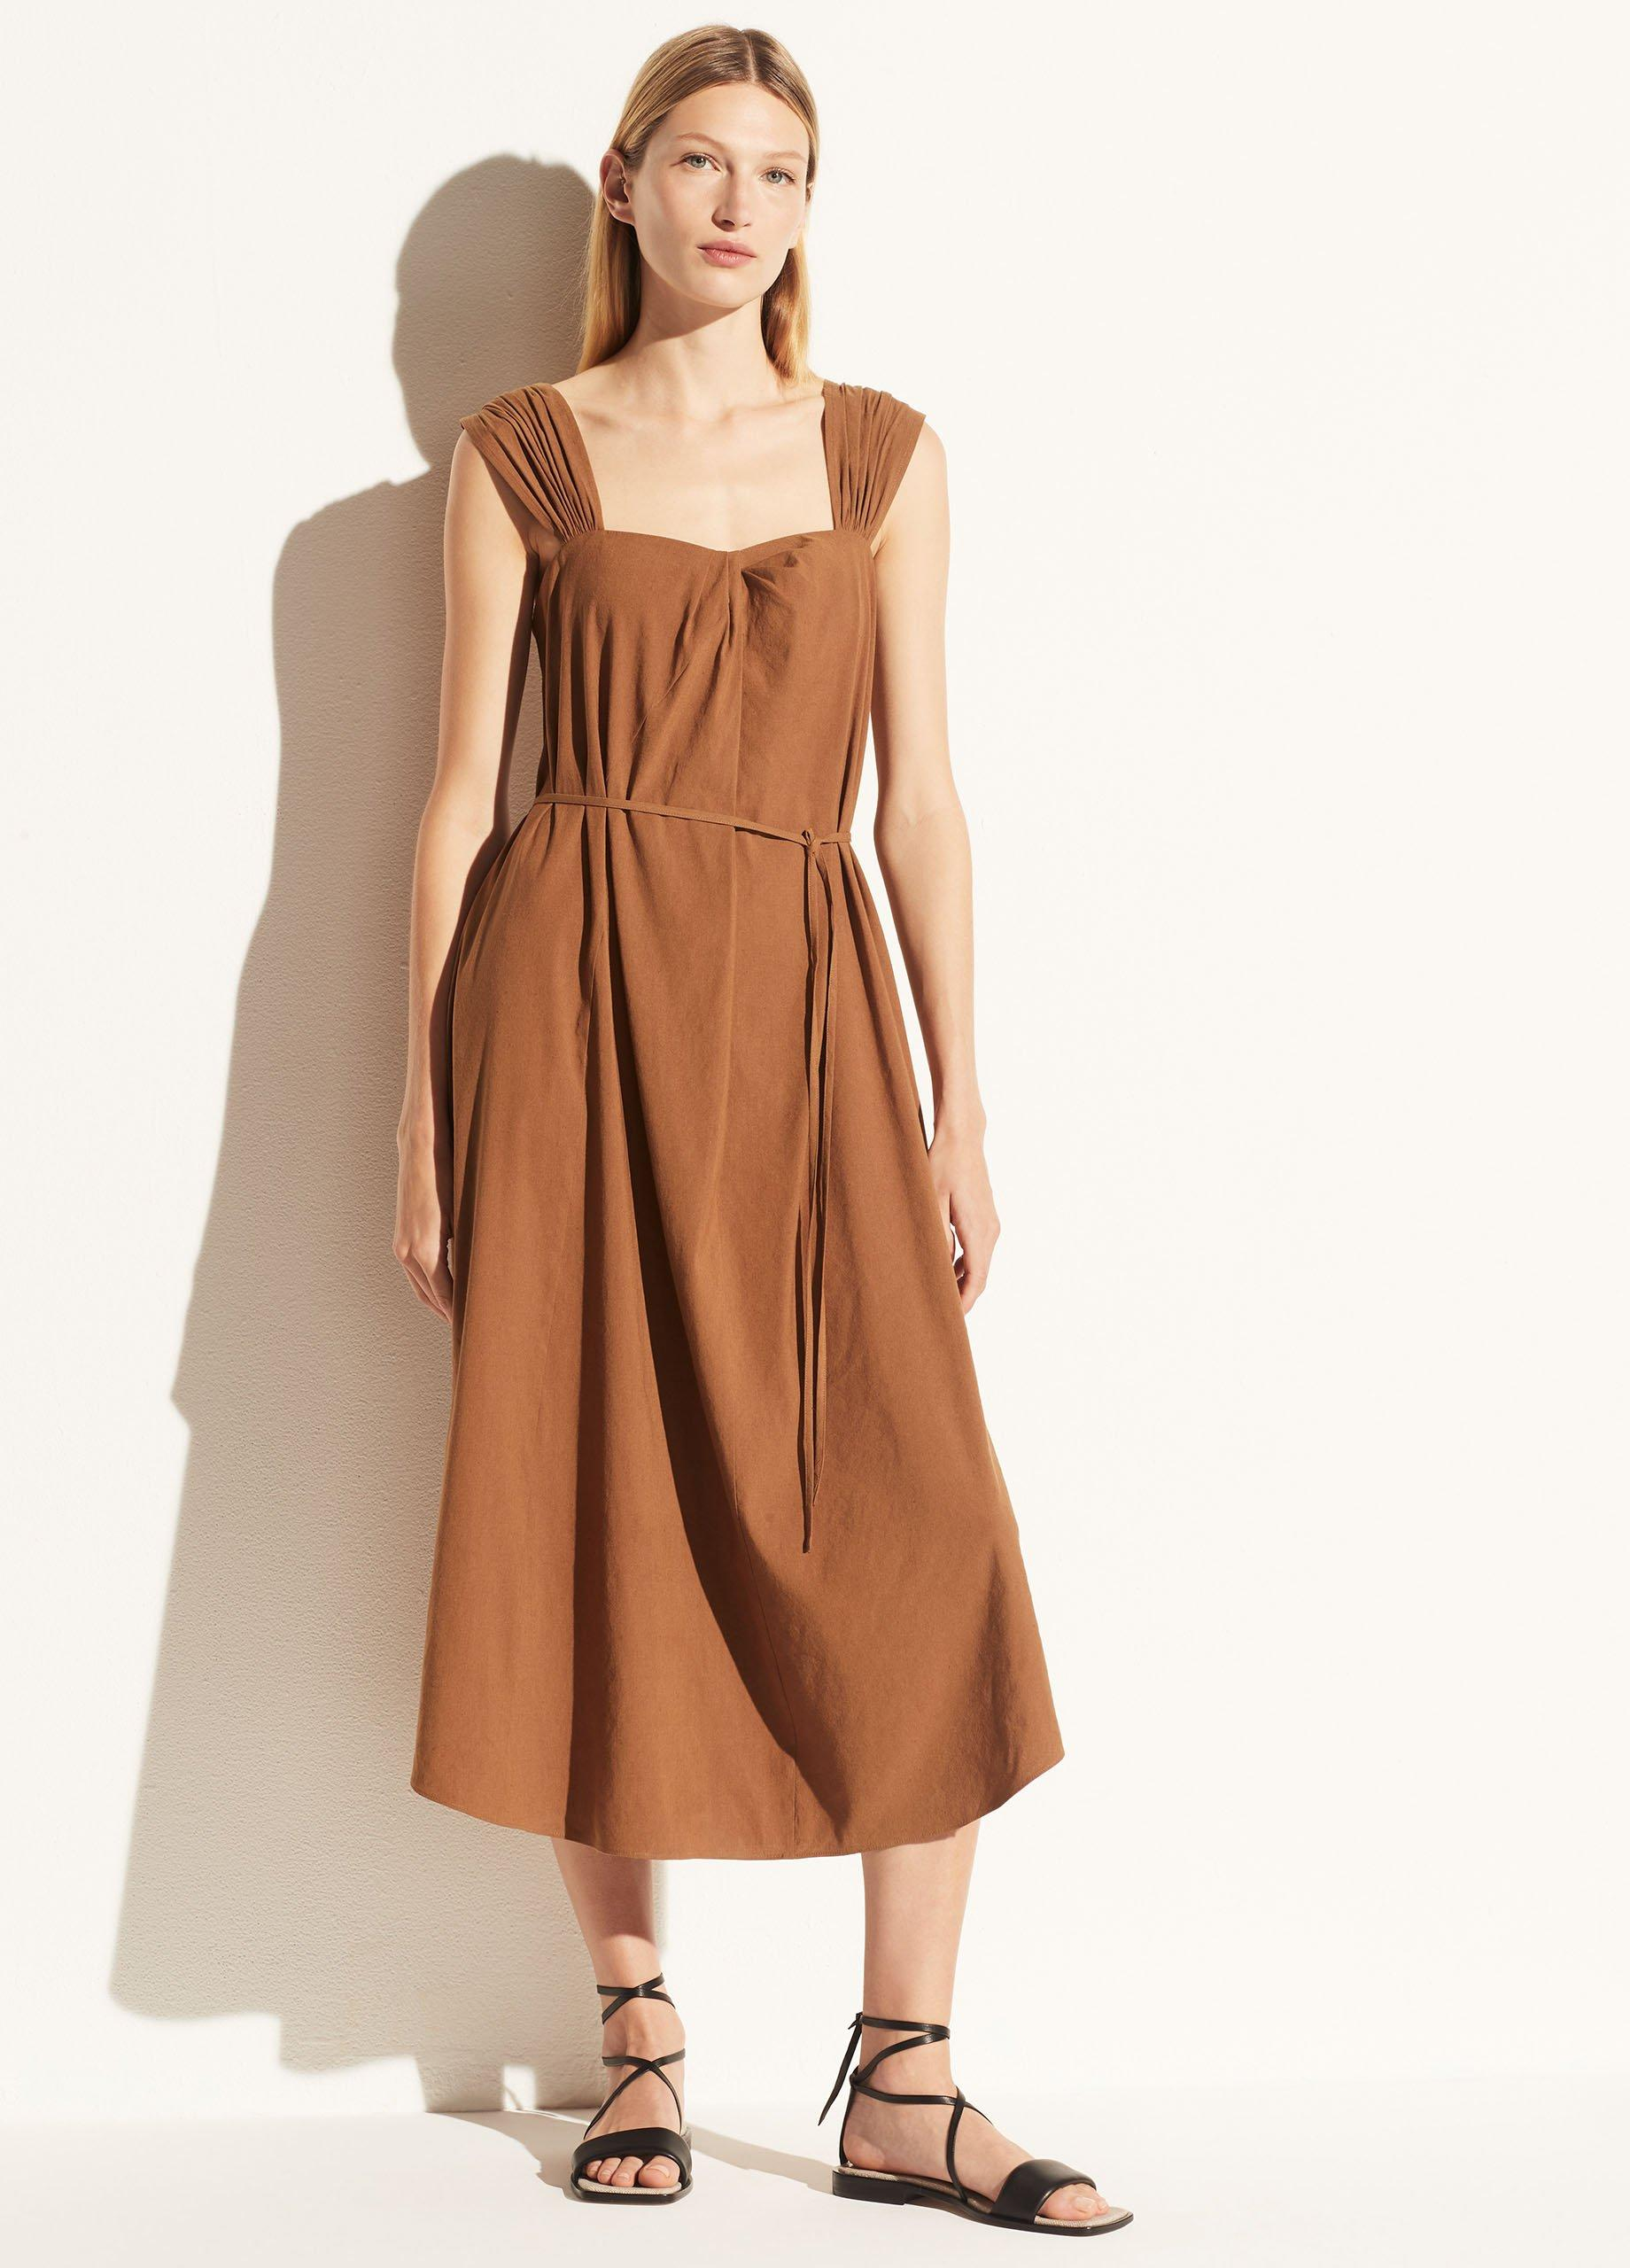 Poet Strap Knot Front Dress